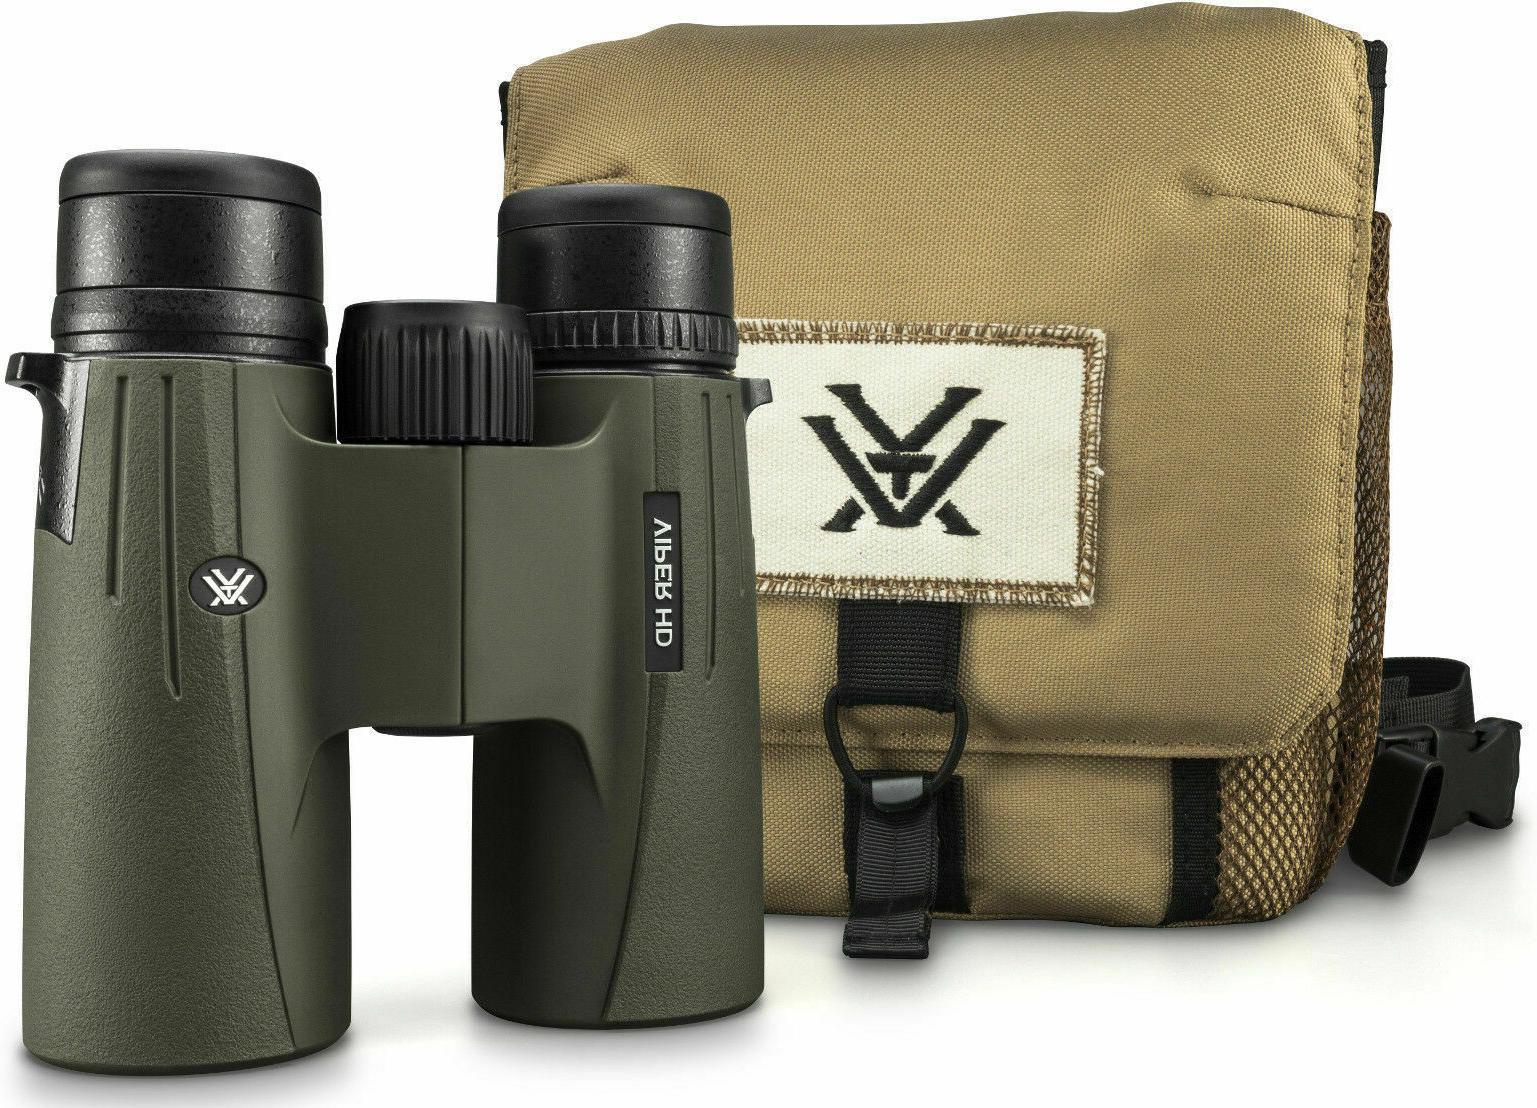 viper 2018 roof prism binoculars